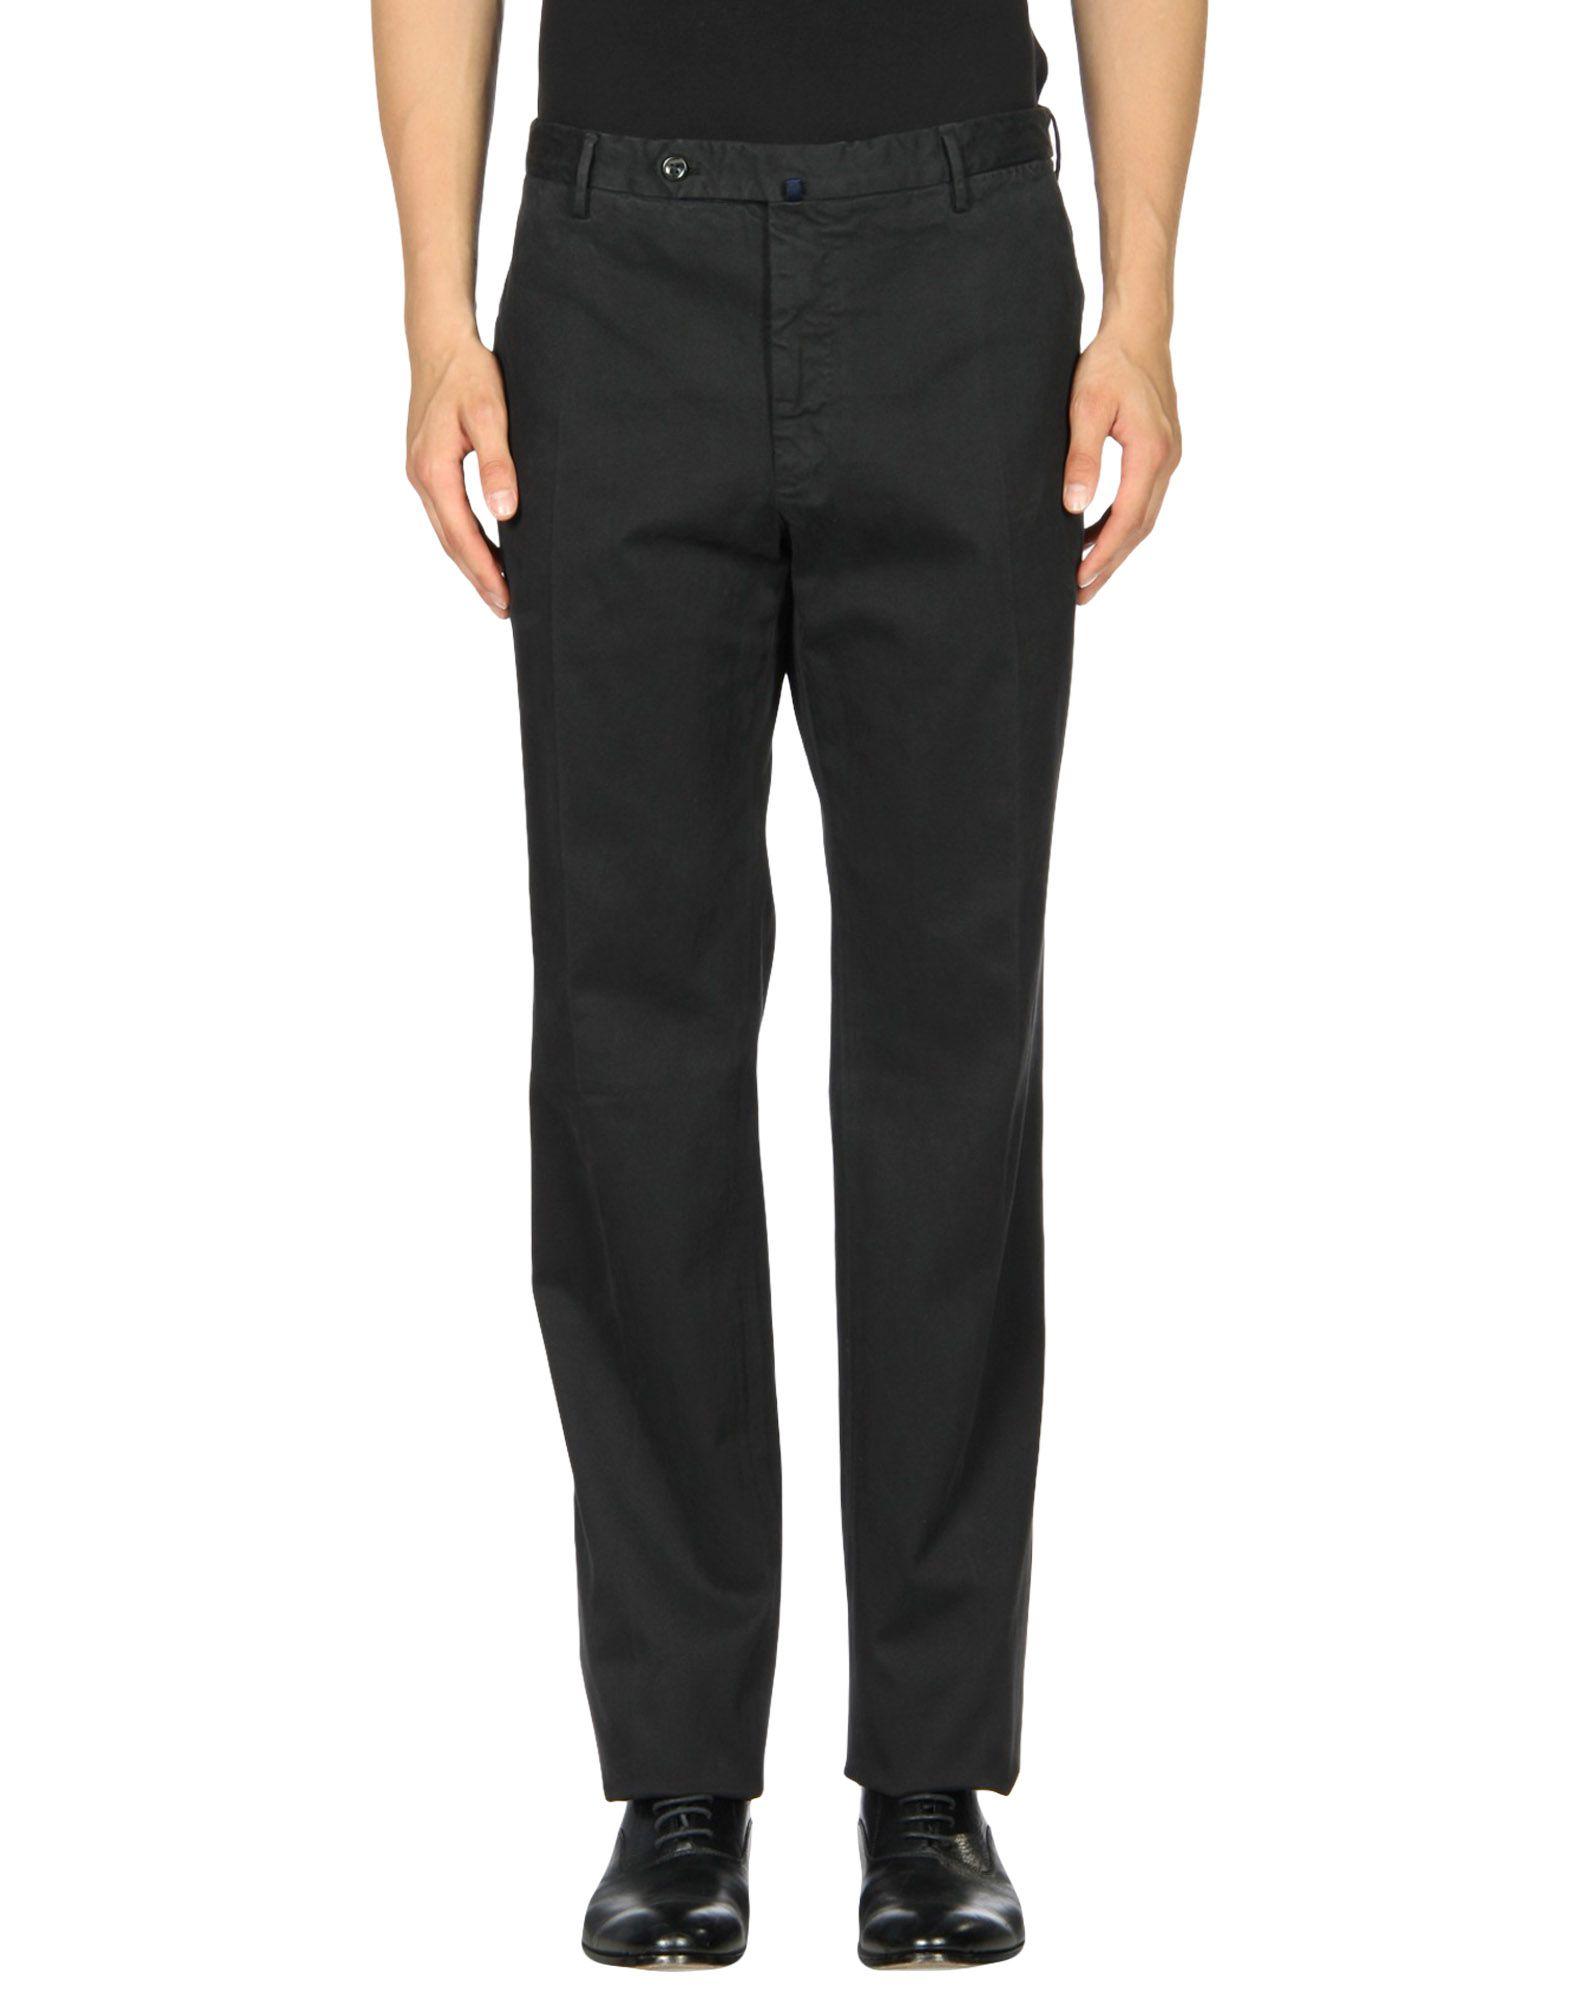 Pantalone Incotex Uomo - Acquista online su